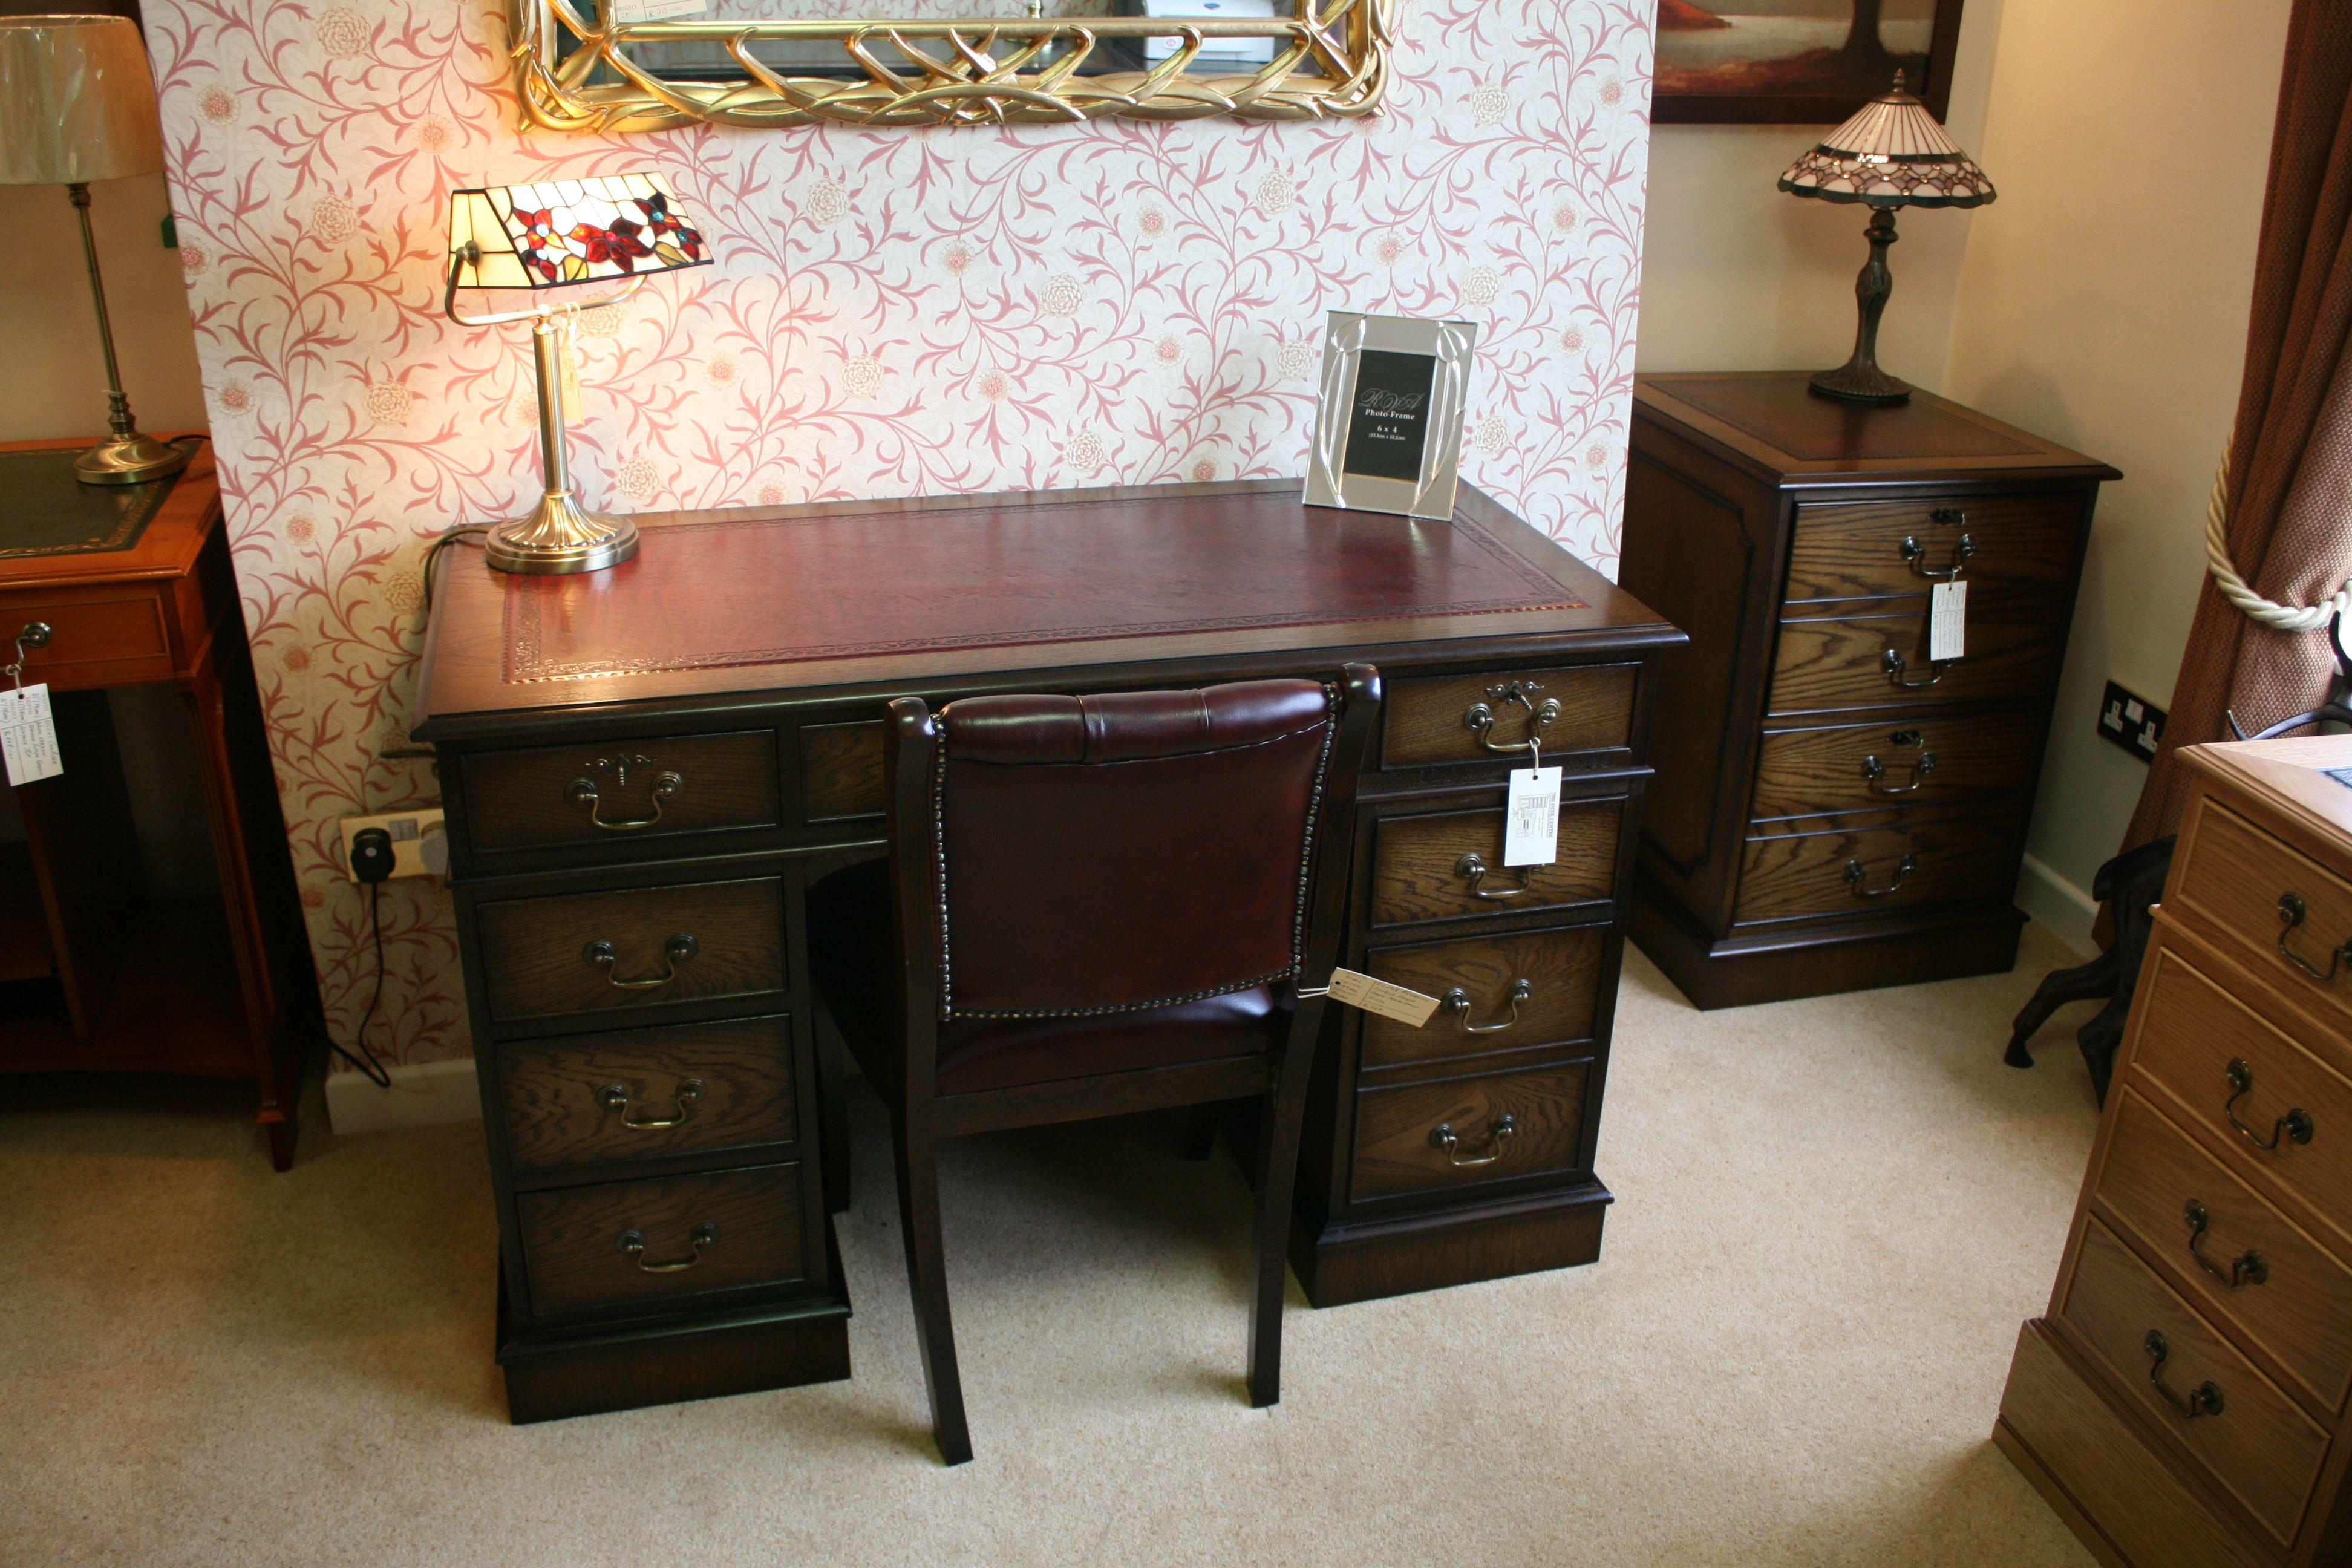 with giveaway filing the file desk big over cabinet diy moon blendtec tutorial